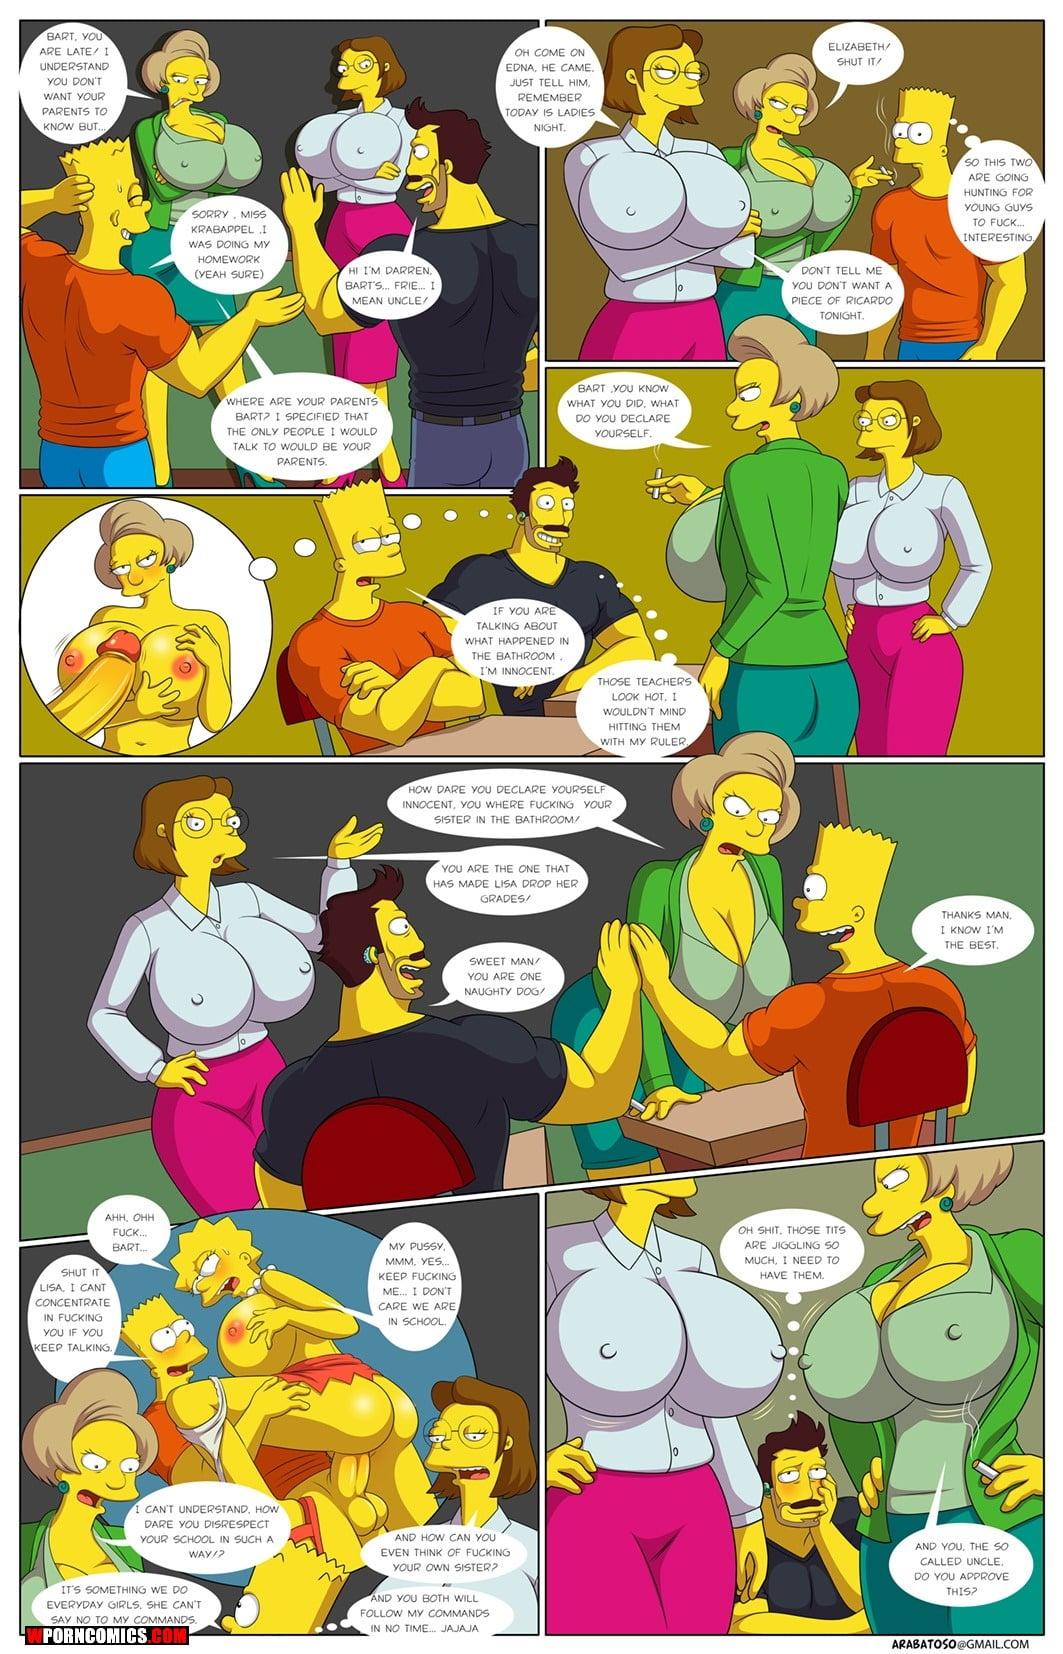 porn-comic-simpsons-darrens-adventure-part-3-2020-03-22/porn-comic-simpsons-darrens-adventure-part-3-2020-03-22-21239.jpg